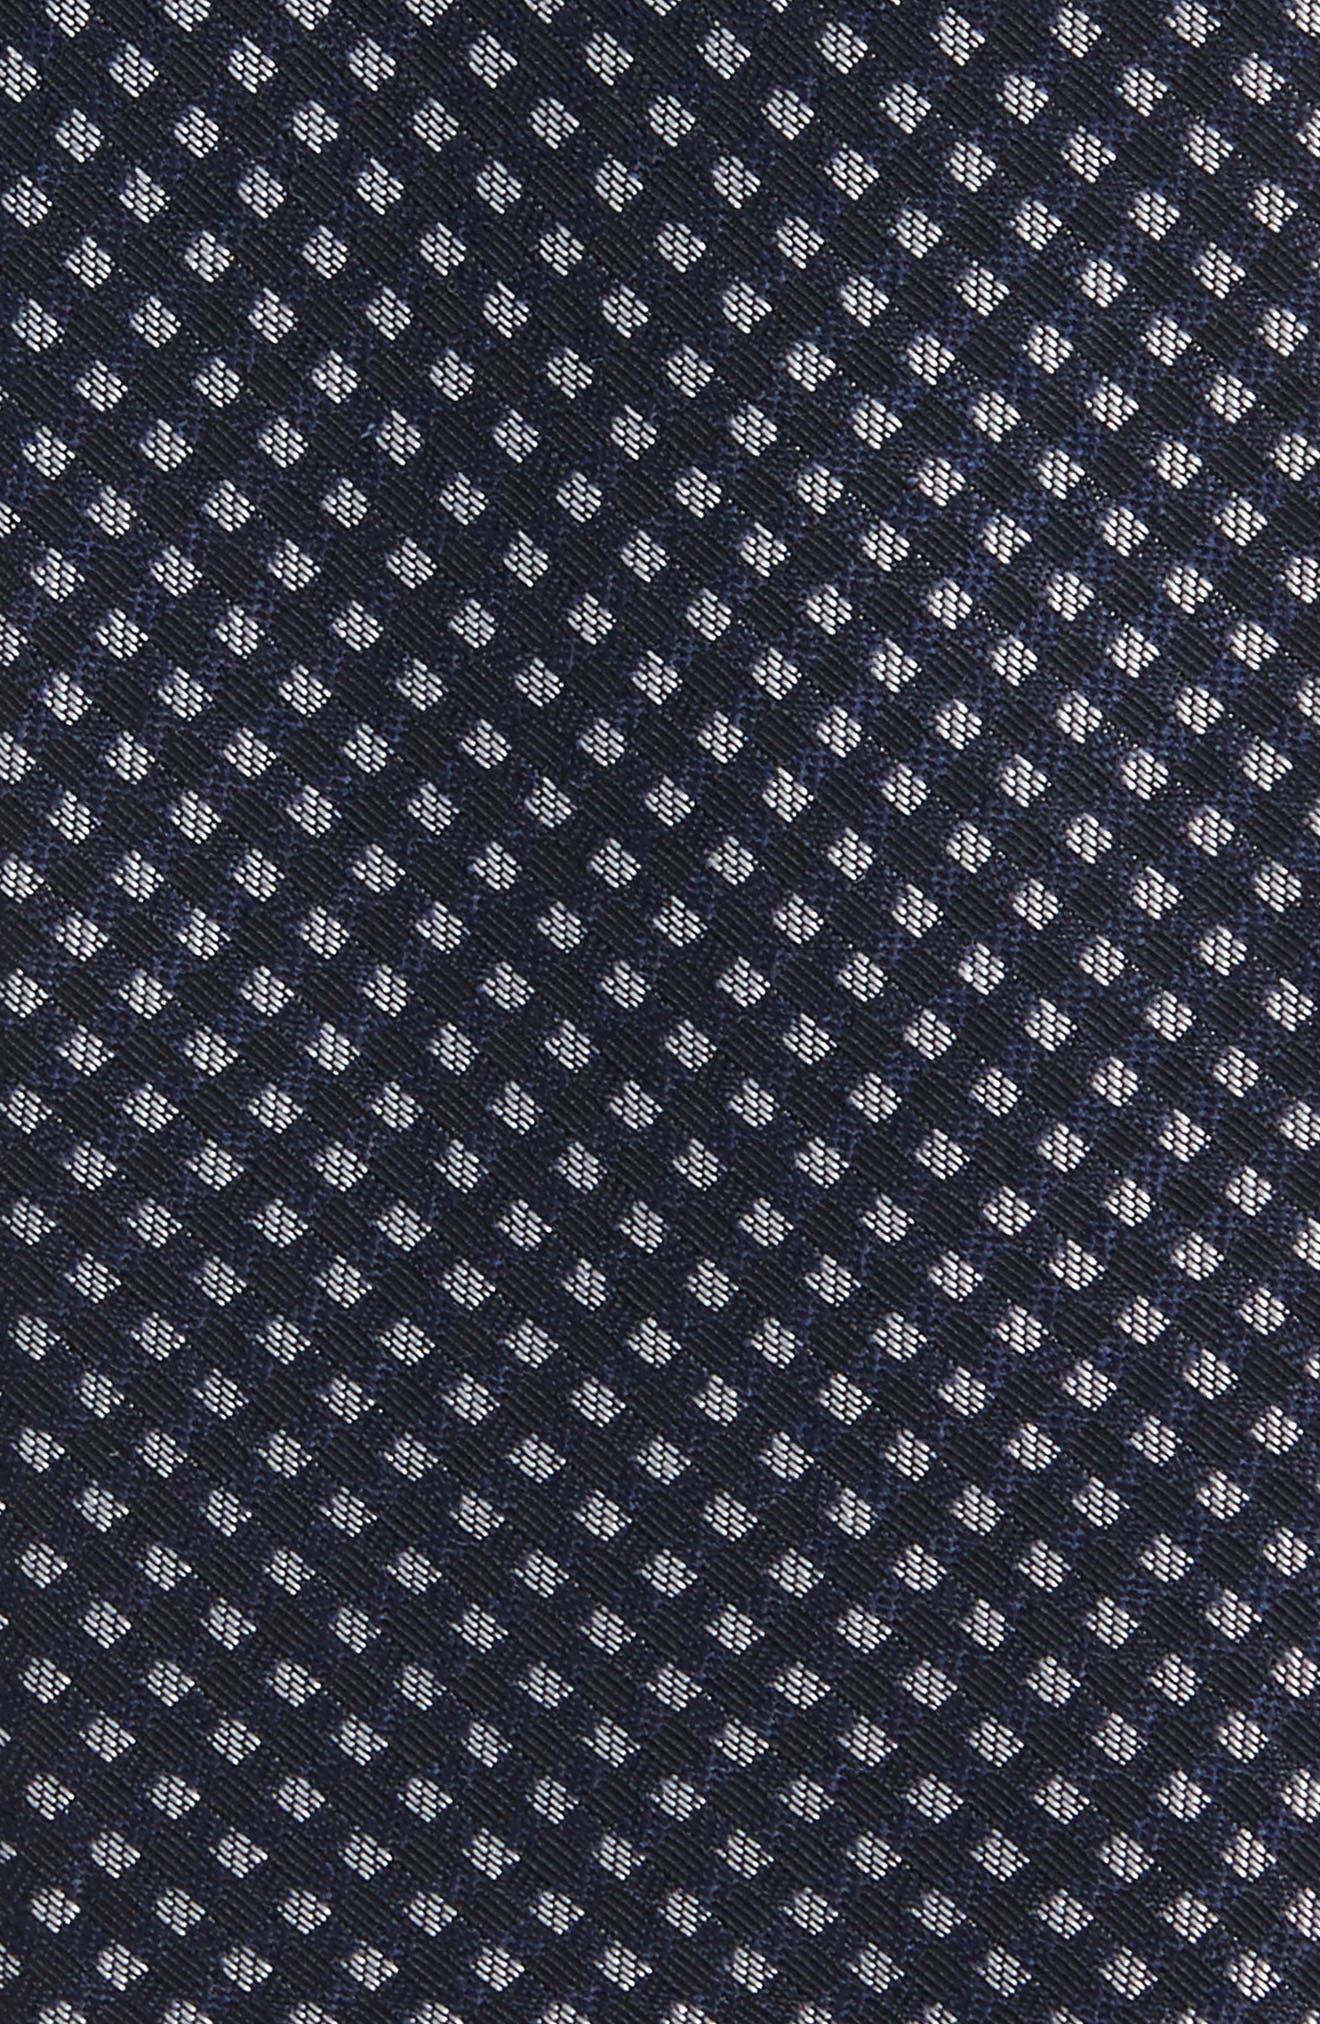 Midnight Silk Tie,                             Alternate thumbnail 2, color,                             Navy